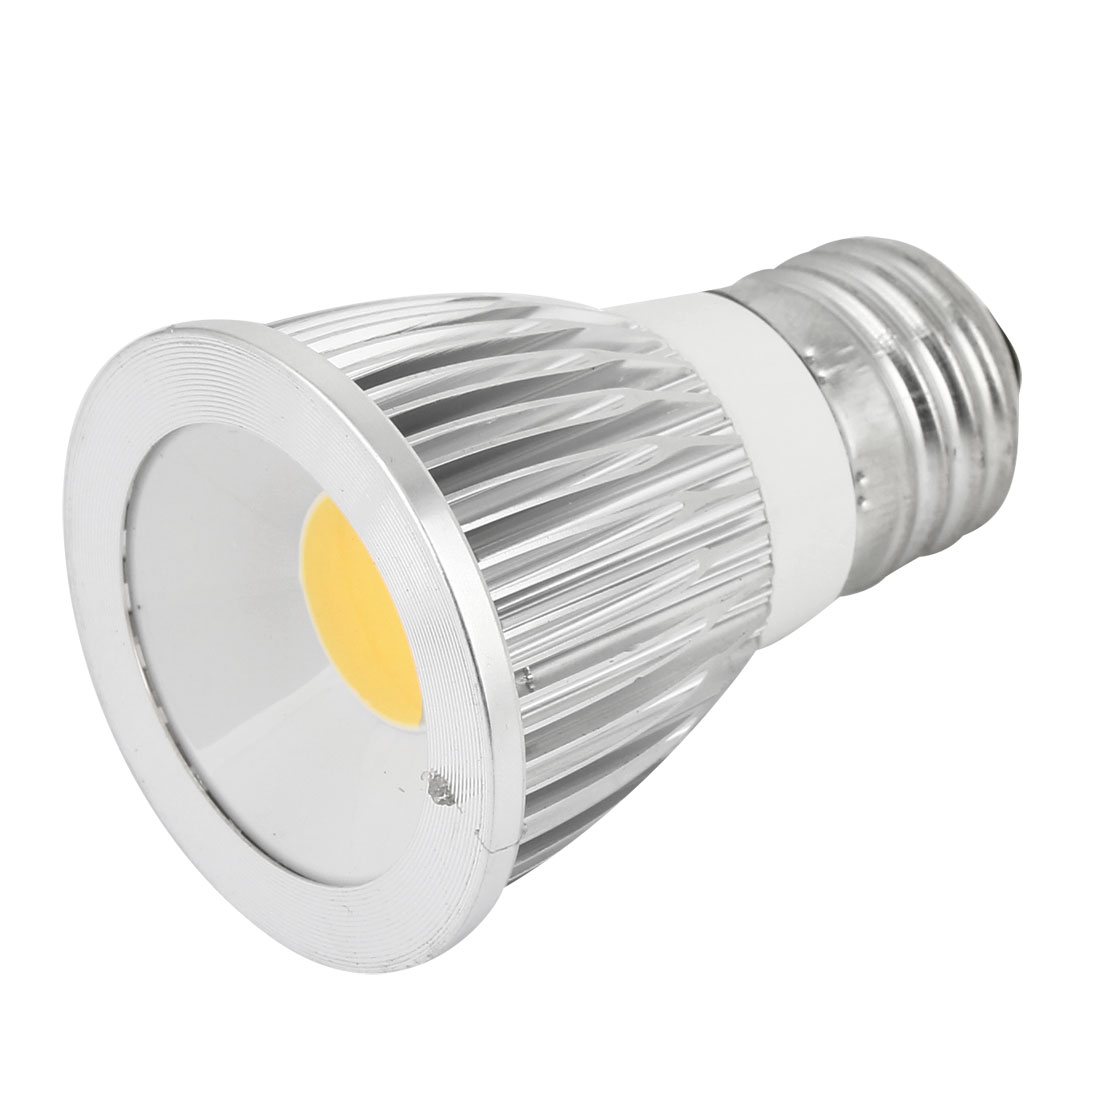 AC 85-265V 9W E27 Dimmable Warm White Light COB LED Downlight Spotlight Bulb